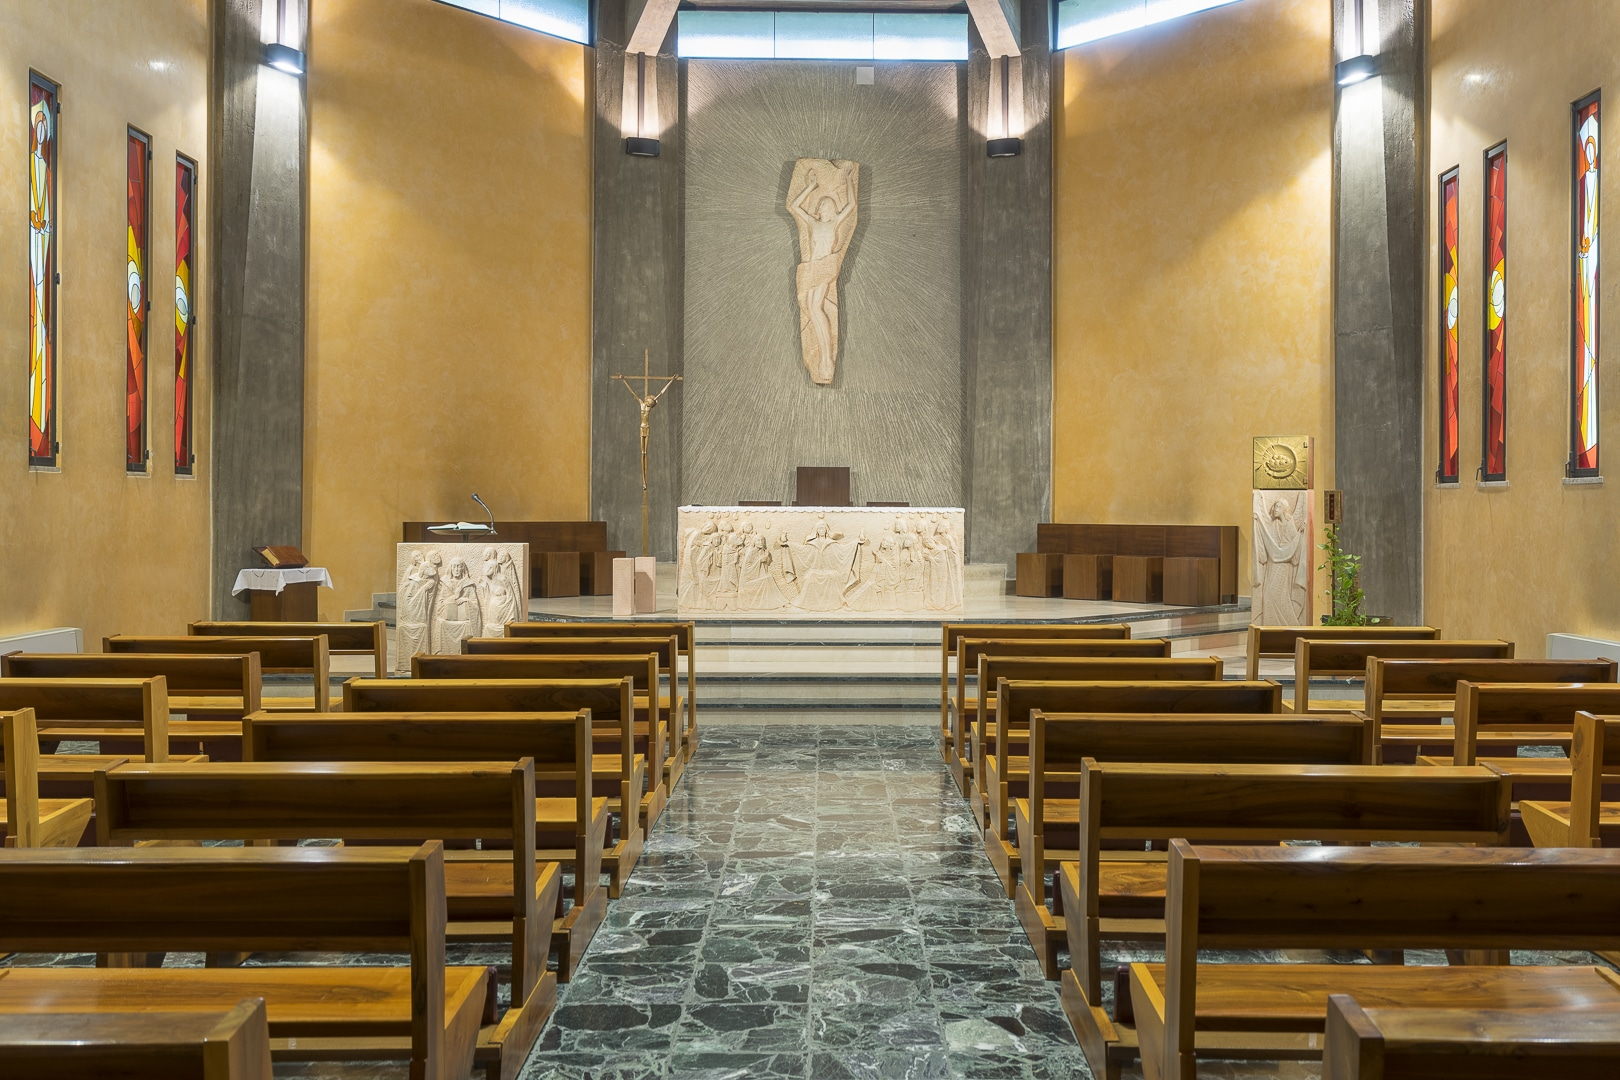 Chiesa Mater Divinae Gratiae Brescia